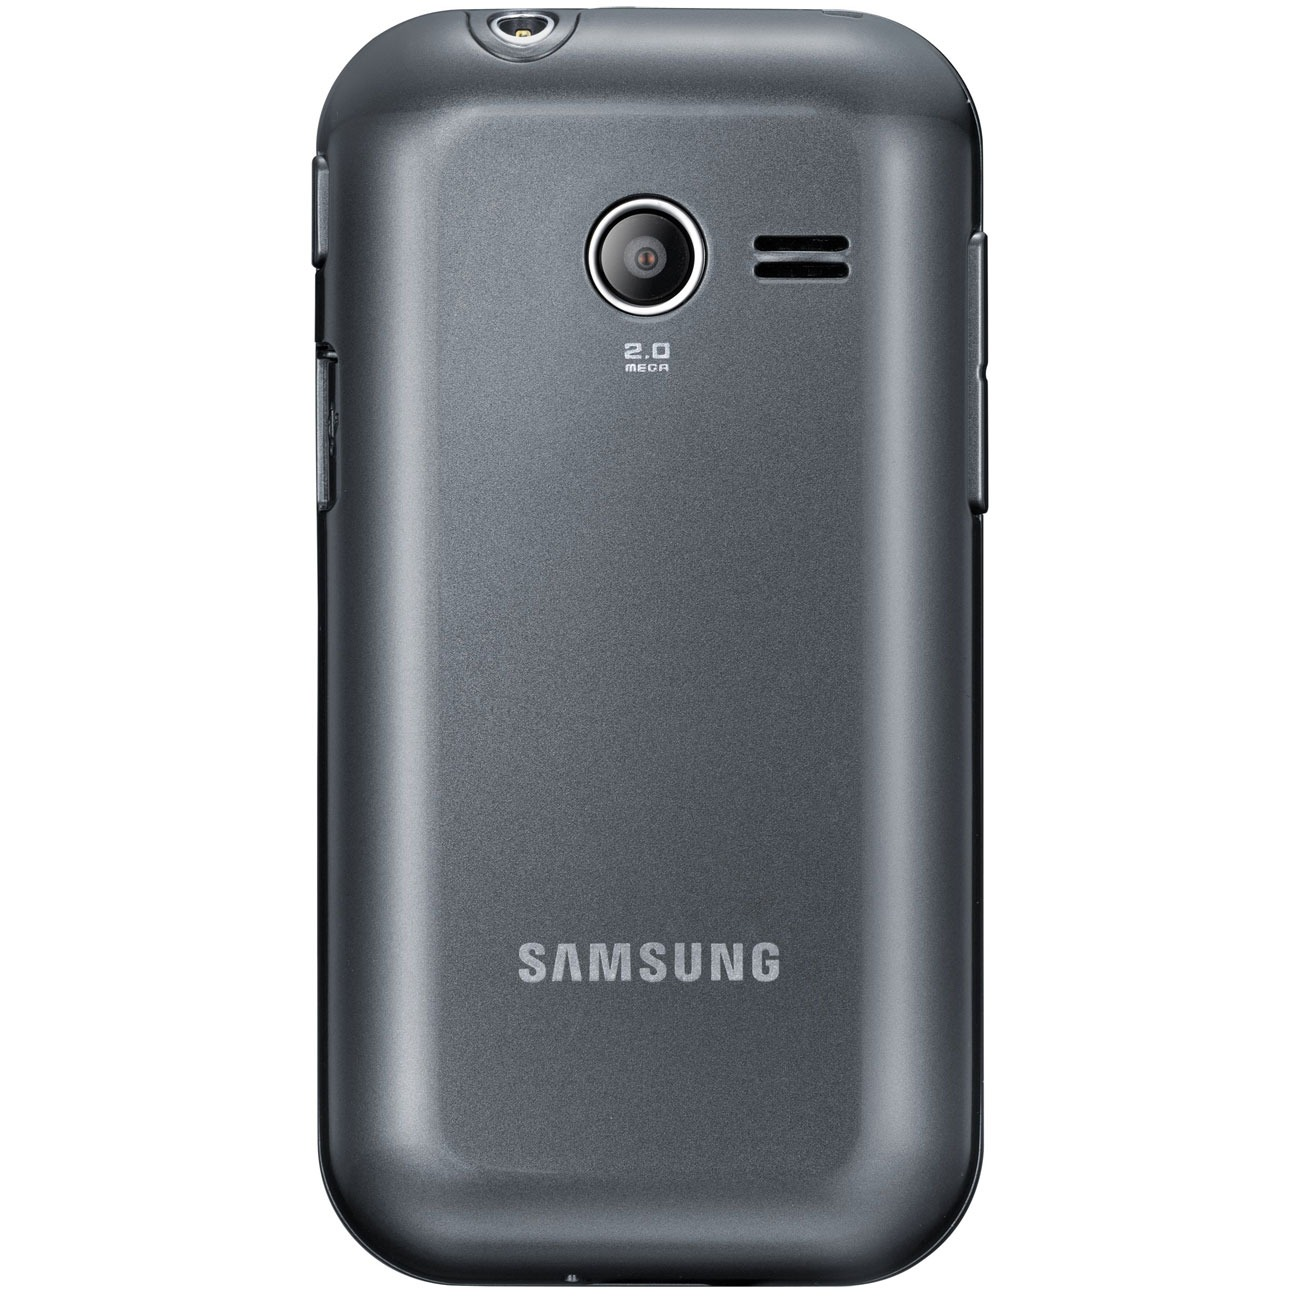 samsung ch t 350 azerty noir mobile smartphone samsung sur. Black Bedroom Furniture Sets. Home Design Ideas